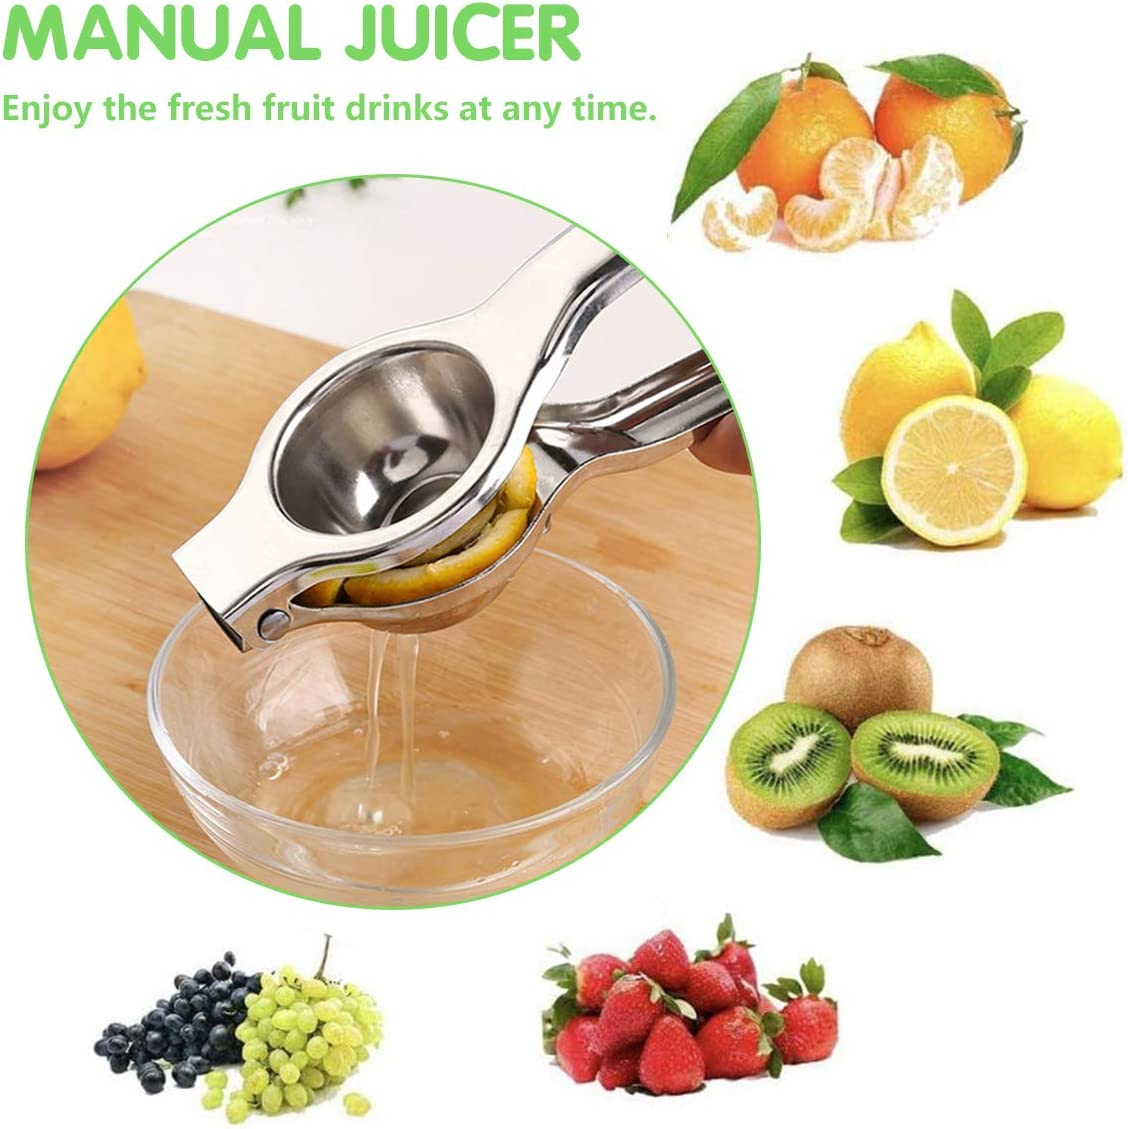 KEMOO Zitronenpresse manuell Orangen-Zitruspresse Saftpresse Einhand-Obstpresse Zitronenpresse Edelstahl Zitronenpresse